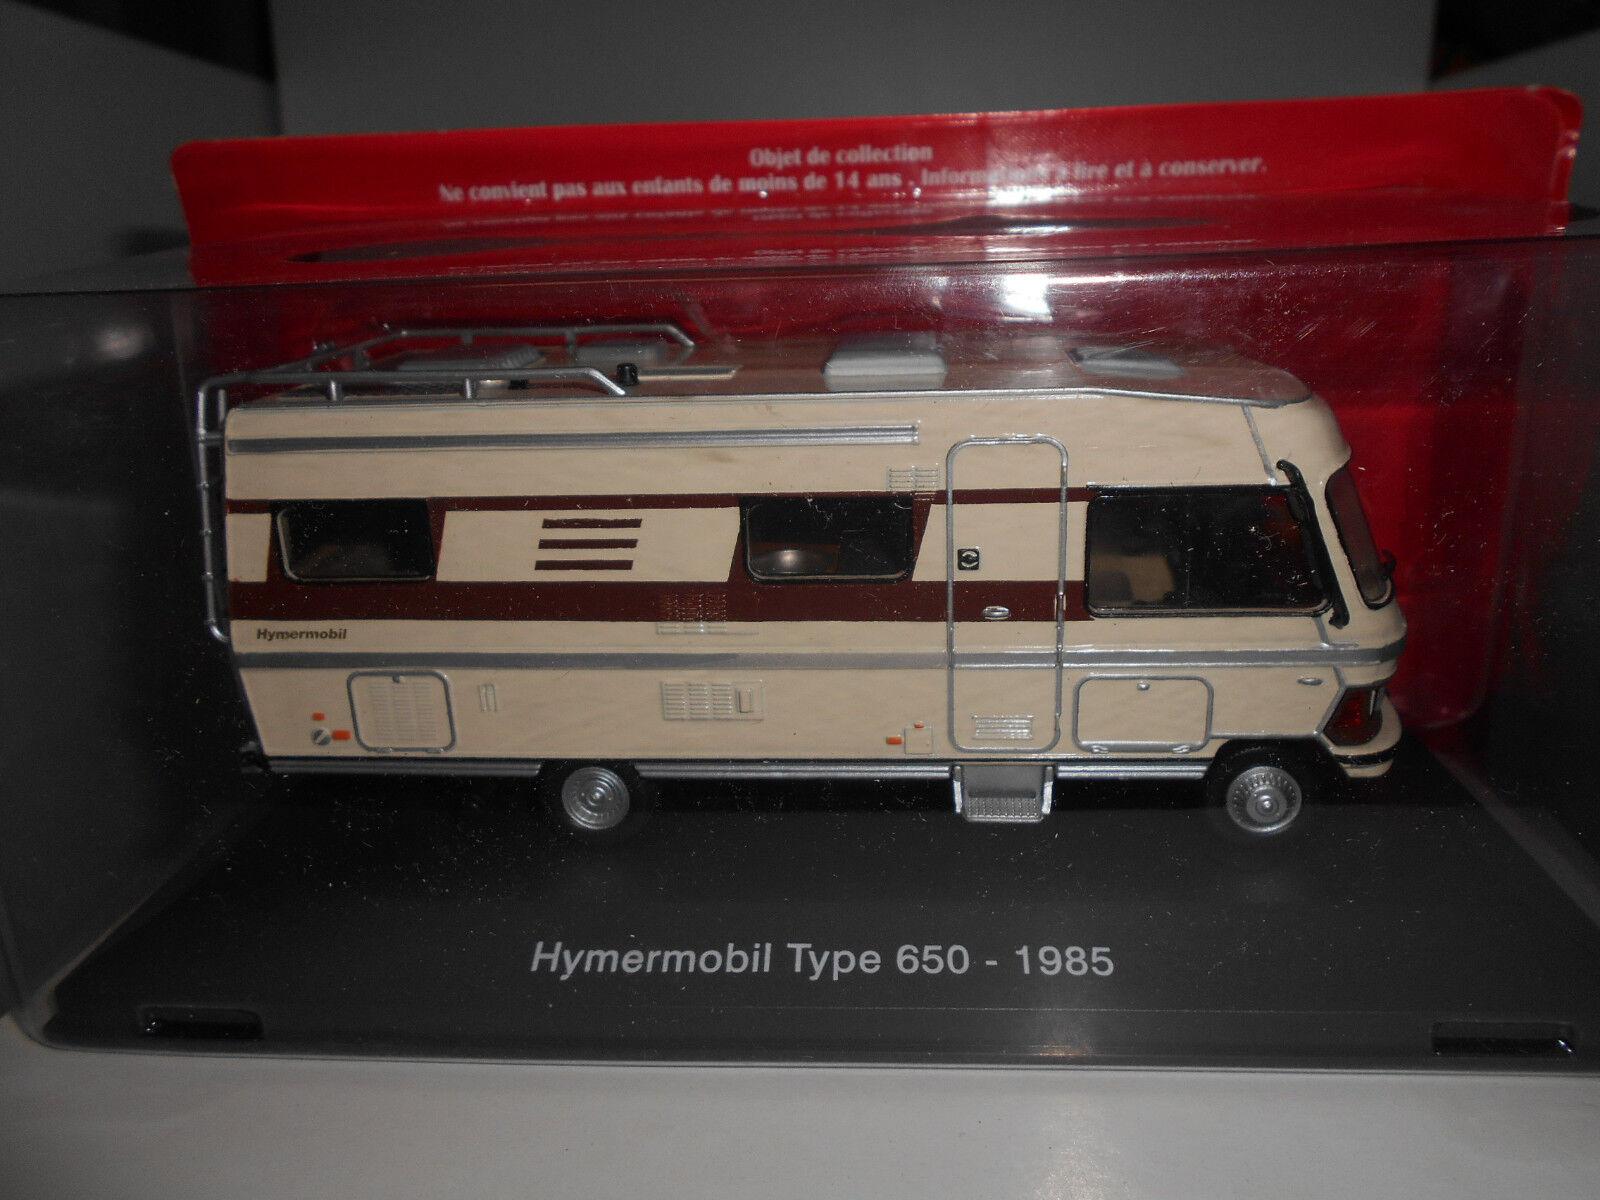 HYMERMOBIL TYPE 650 MERCEDES-BENZ CAMPING CAR CAR CAR HACHETTE 1 43 8ed982